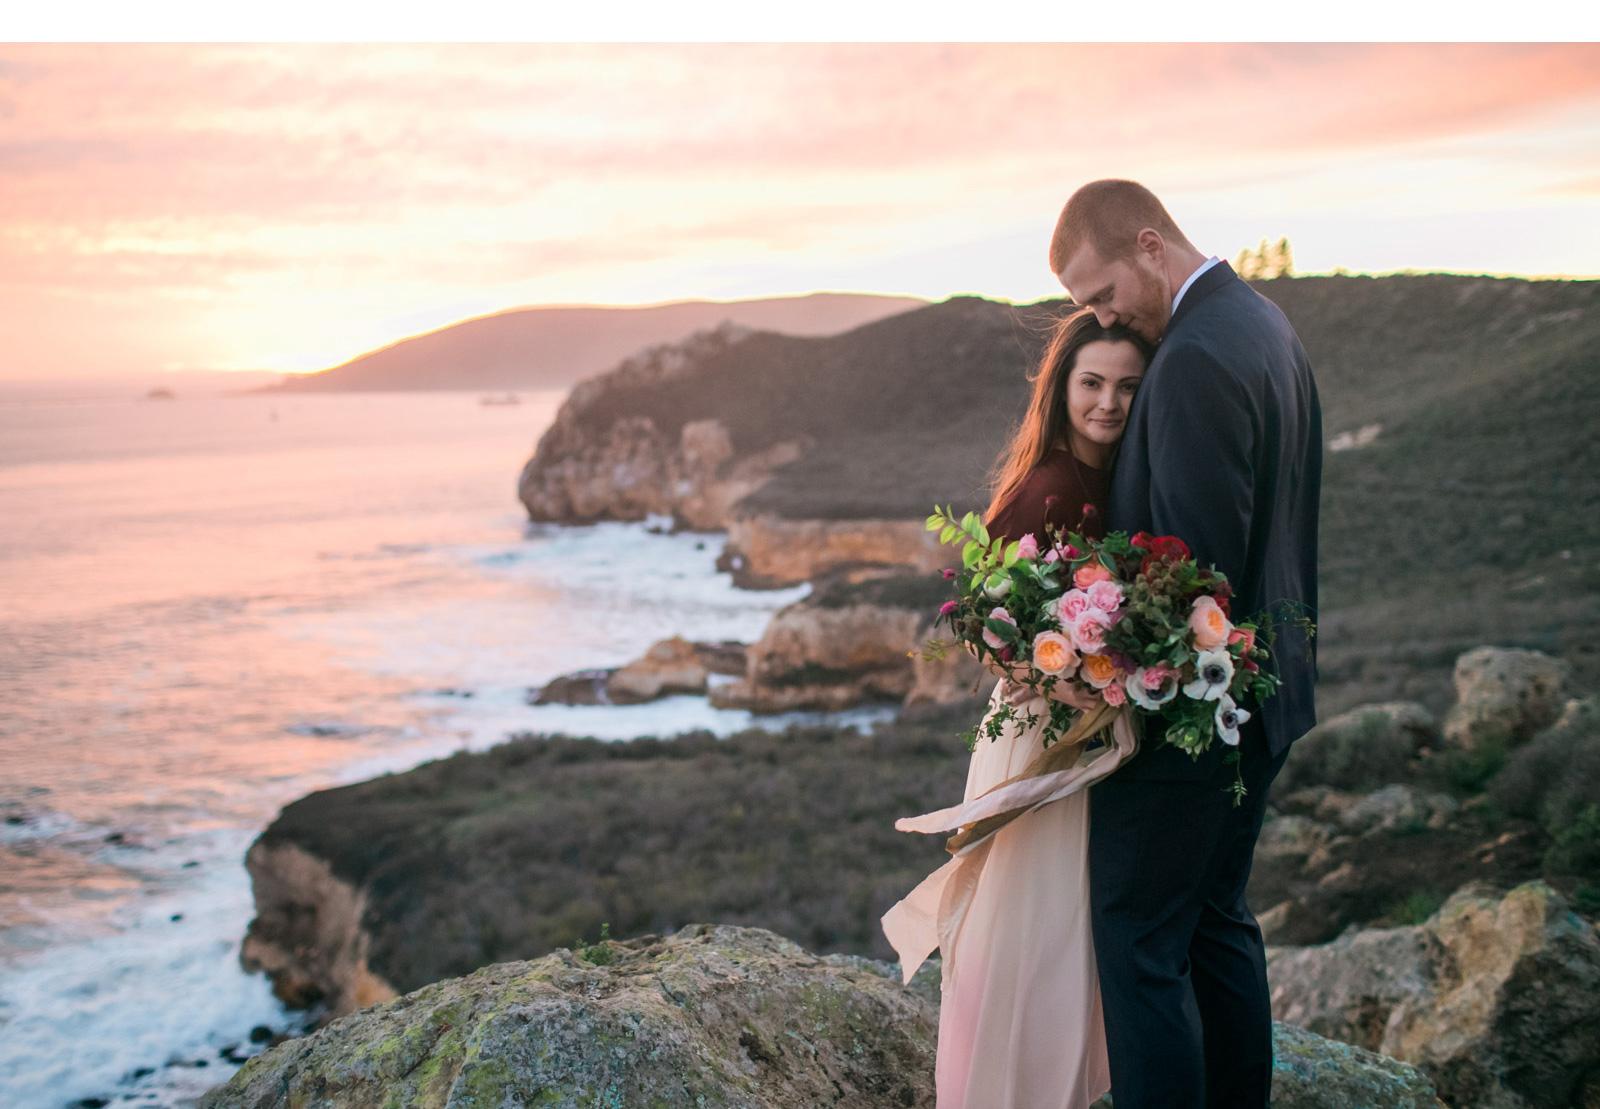 Central-Coast-Wedding-Photographer-Natalie-Schutt-Photography_04.jpg